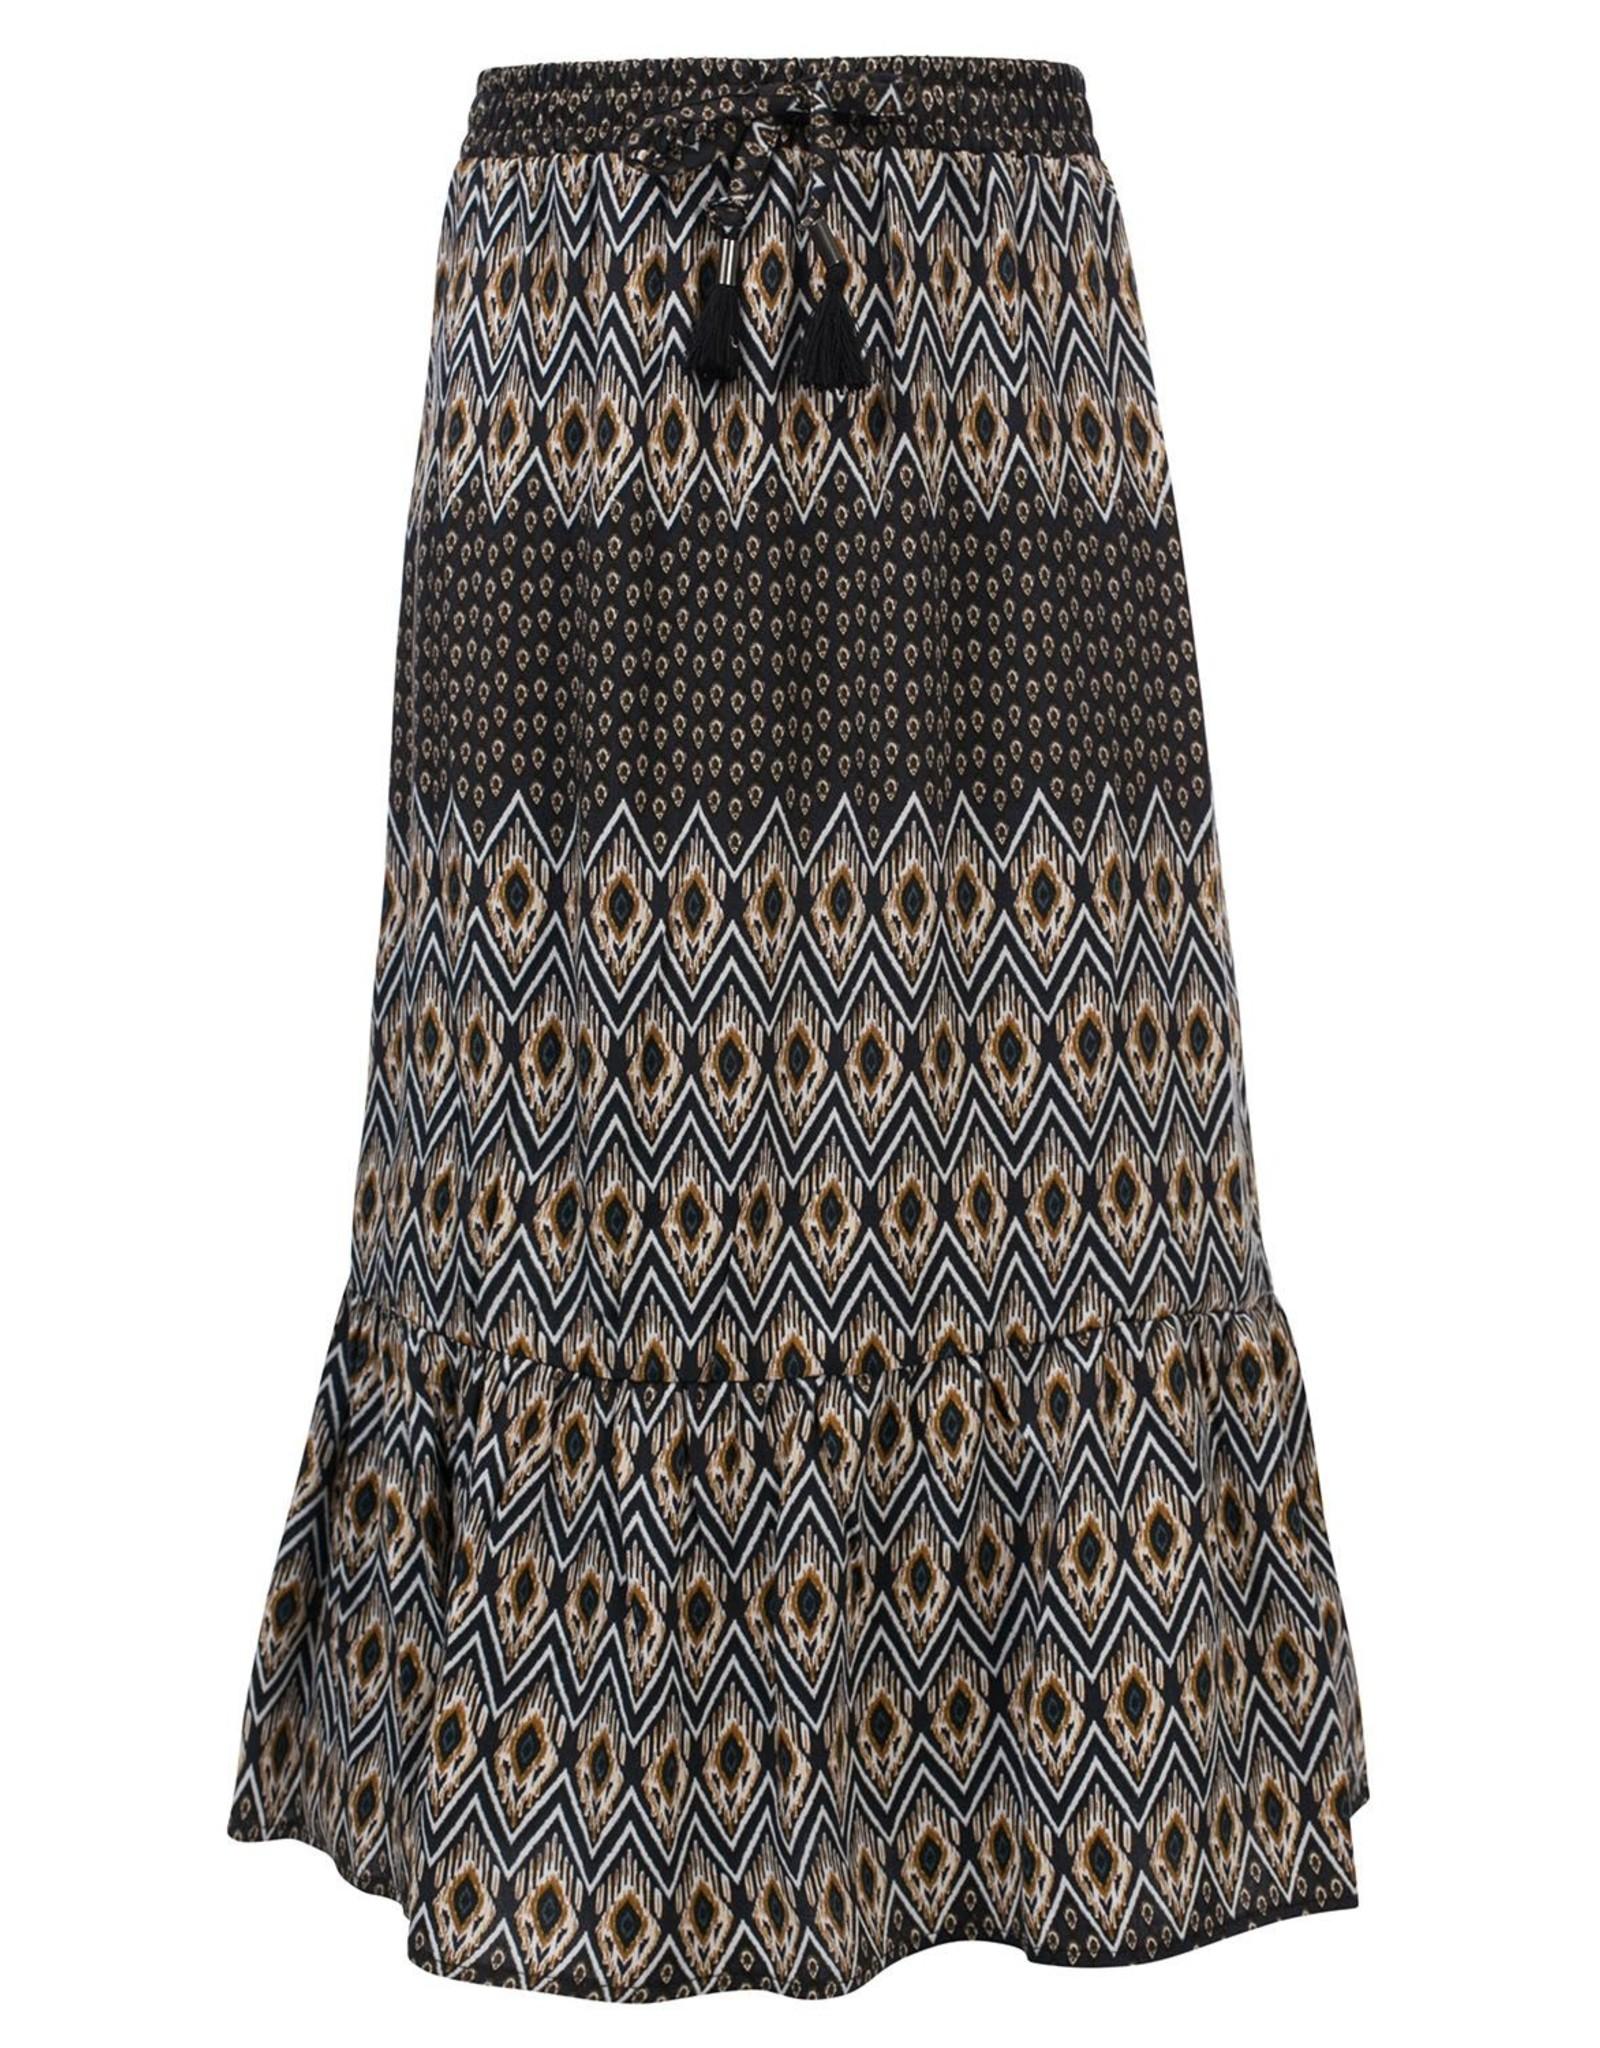 looxs 2131-5706  Printed Long Skirt